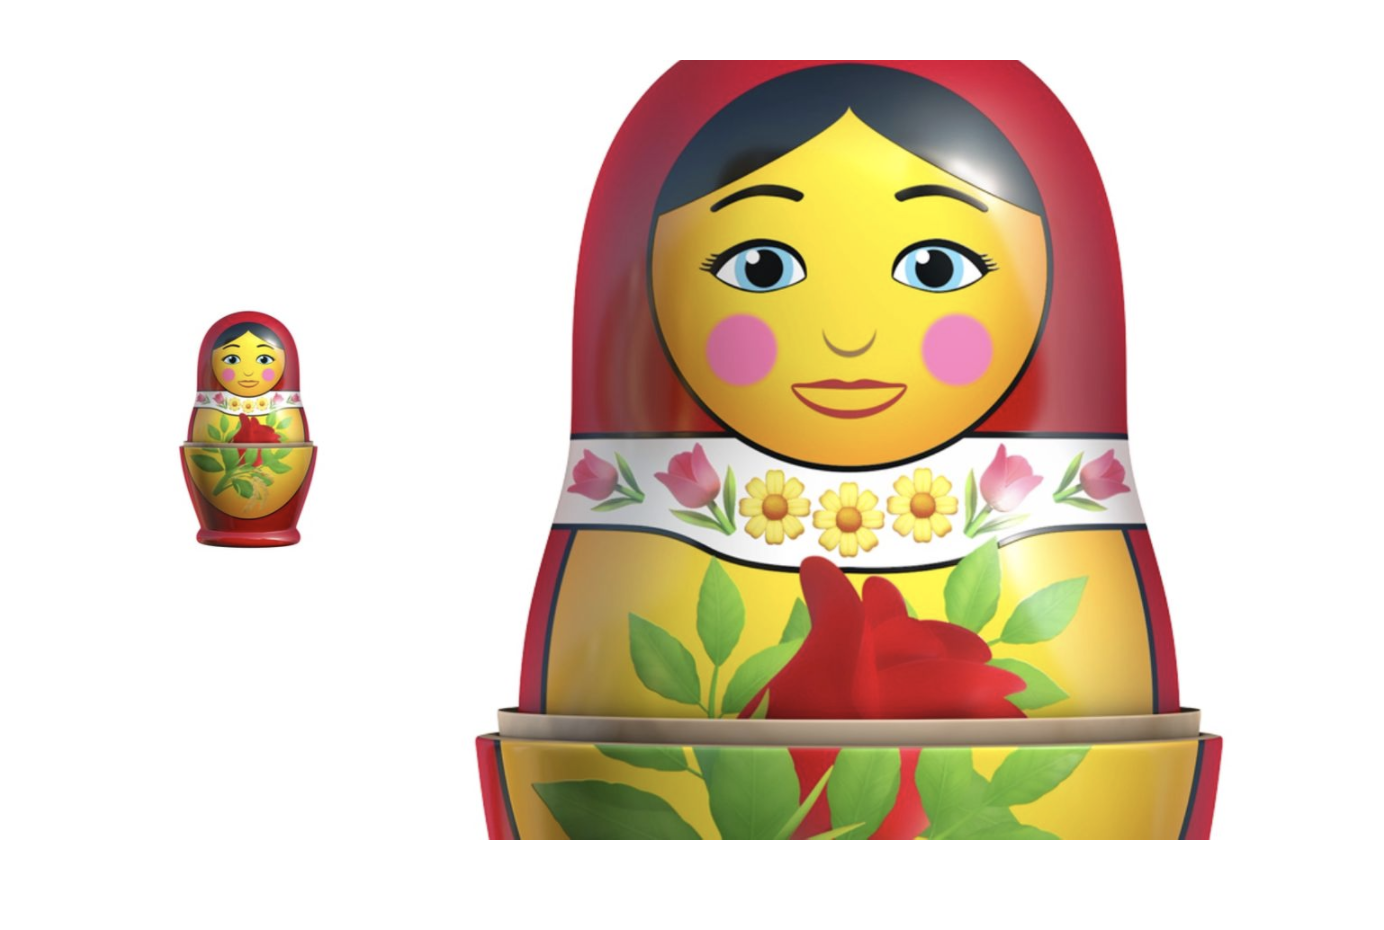 A Look At The New Emojis Coming To Ios Techwalla New Emojis Emoji World Emoji Day